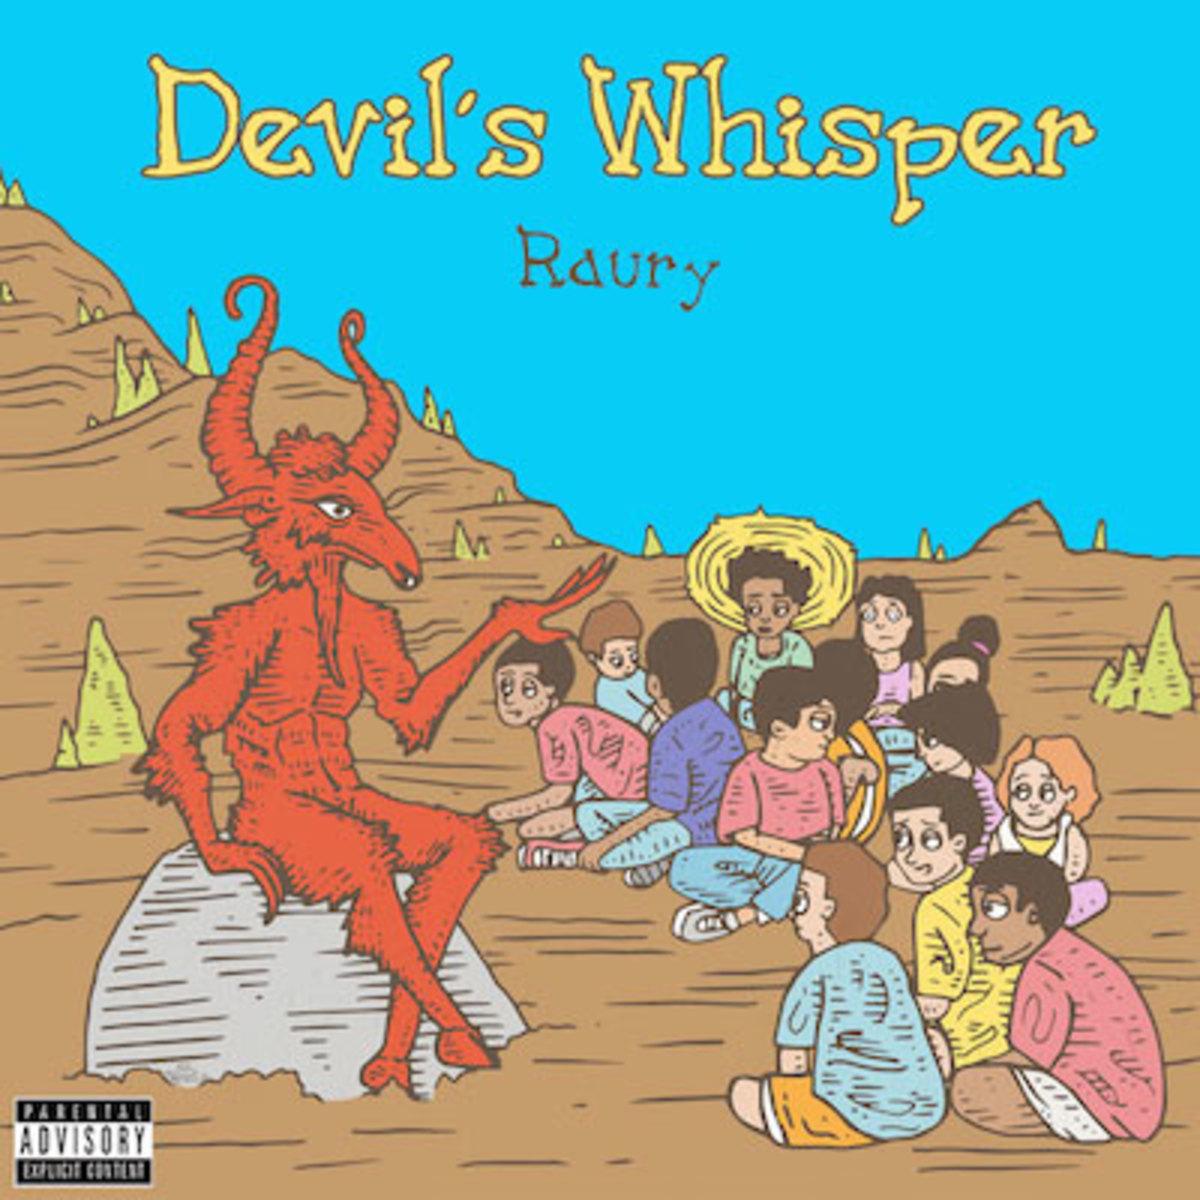 raury-devils-whisper.jpg